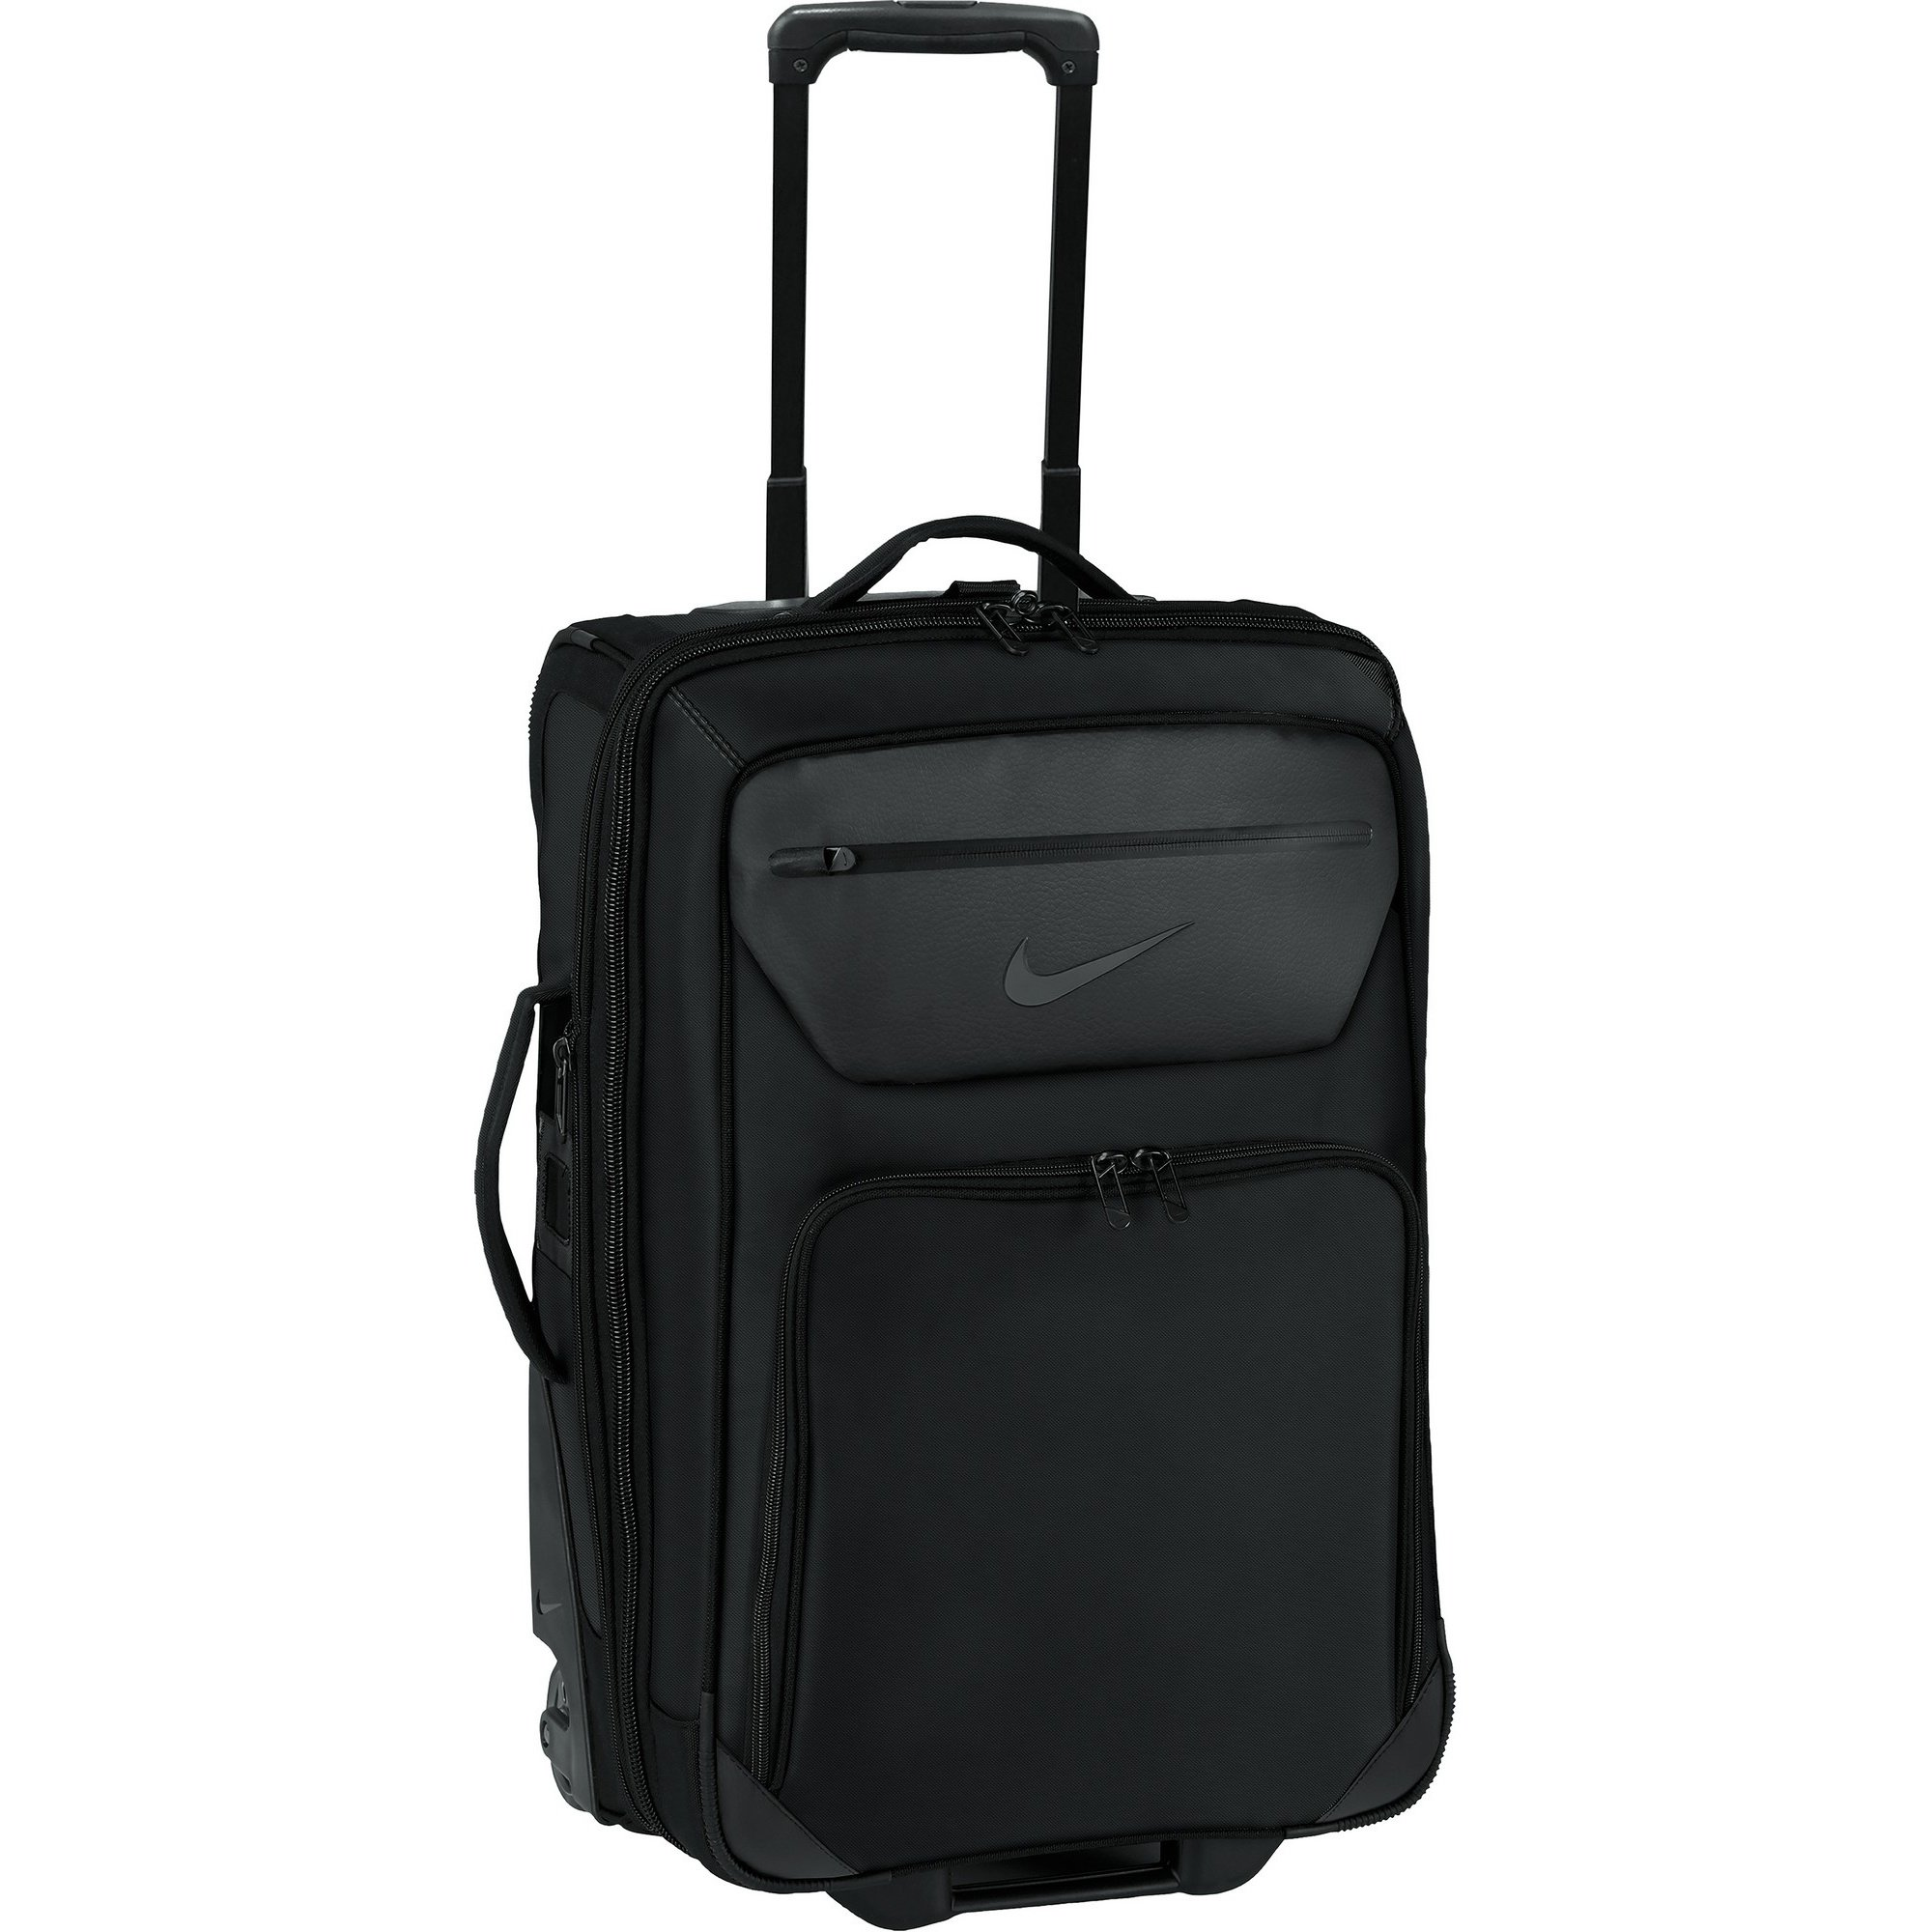 Nike Departure III Roller Luggage Bag (One Size) (Black)